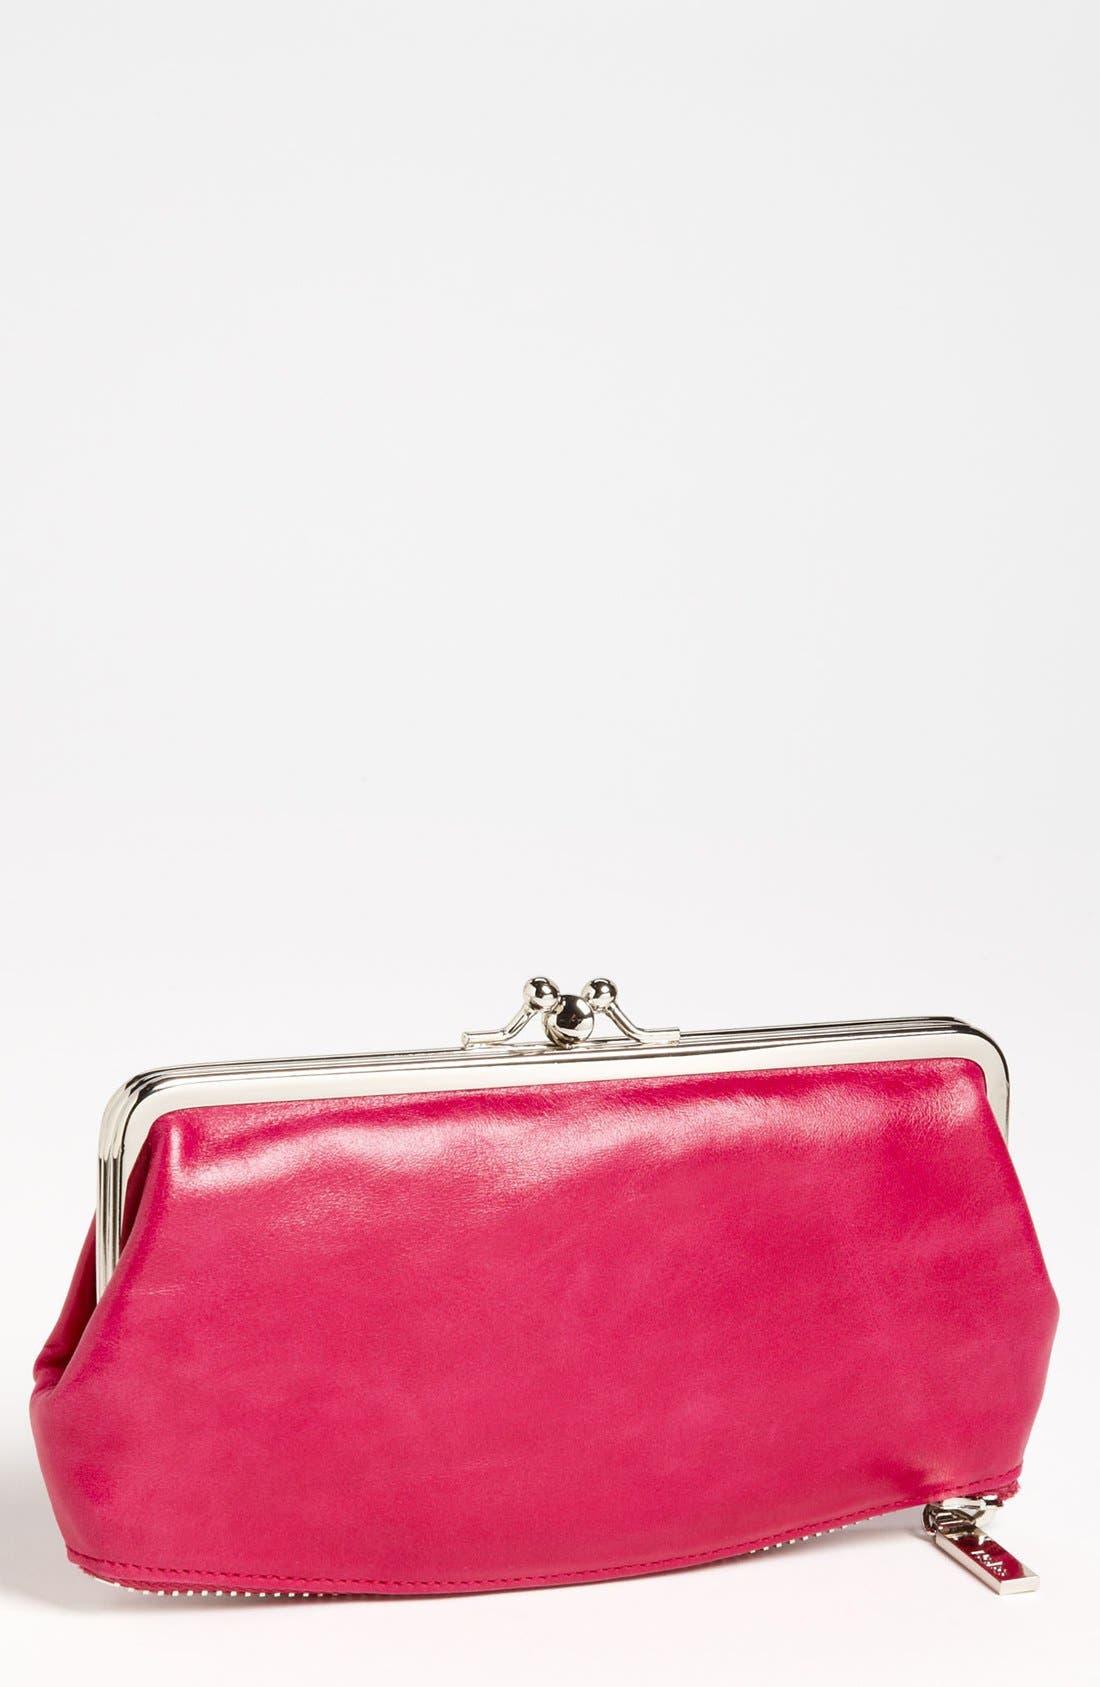 Main Image - Hobo 'Vintage Millie' Kisslock Clutch Wallet